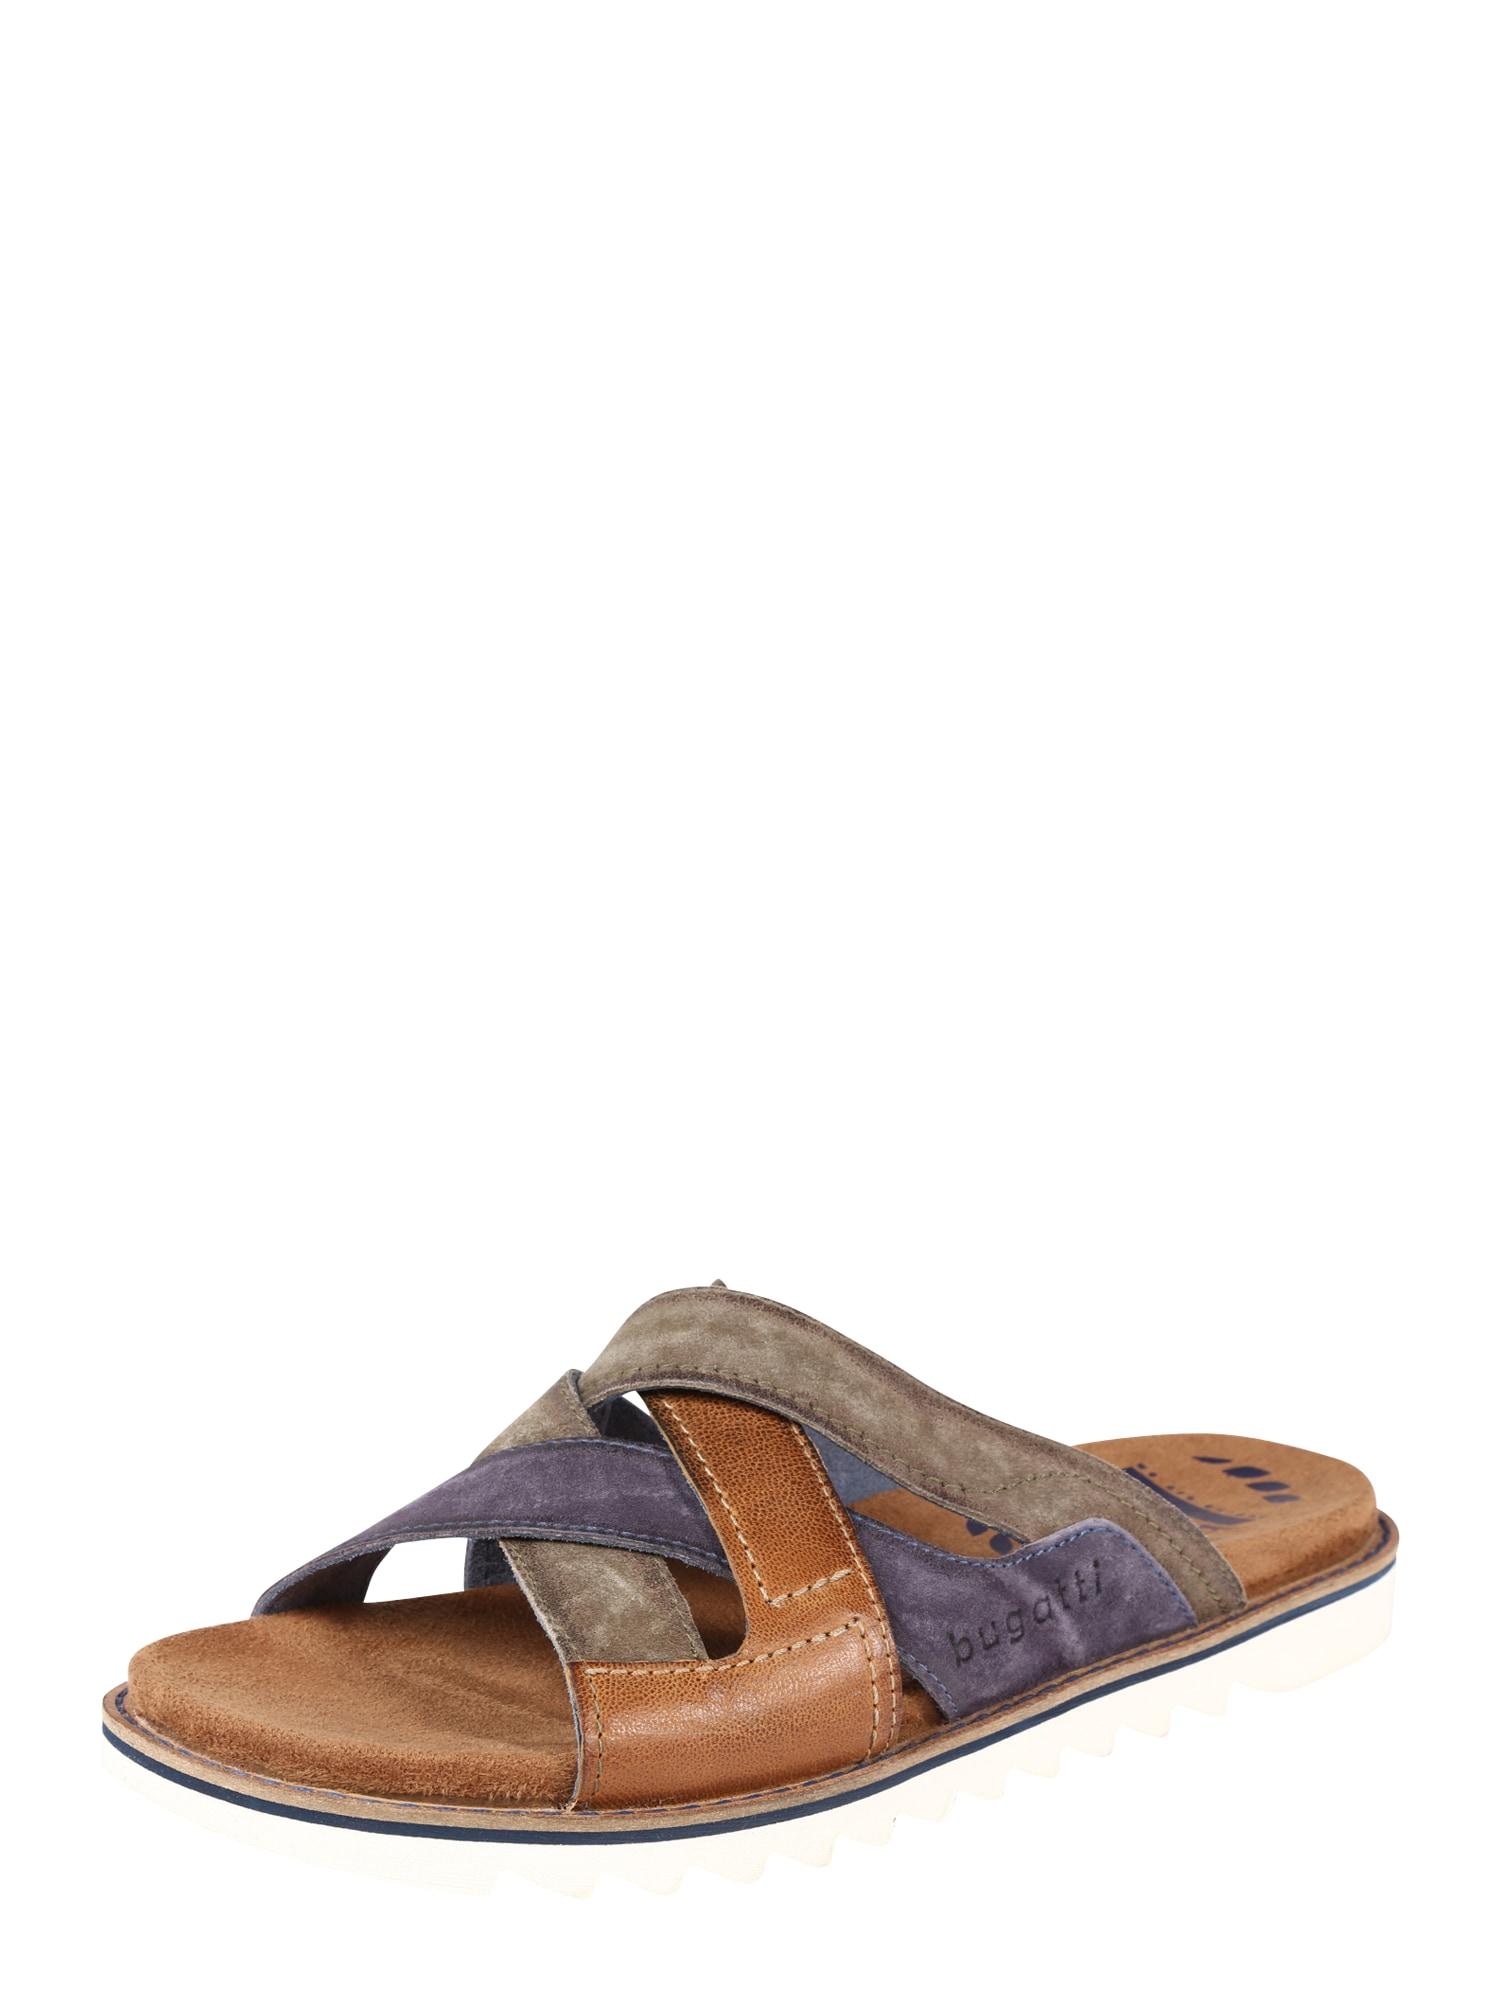 Sandale 'Limon' | Schuhe > Sandalen & Zehentrenner > Sandalen | Bugatti